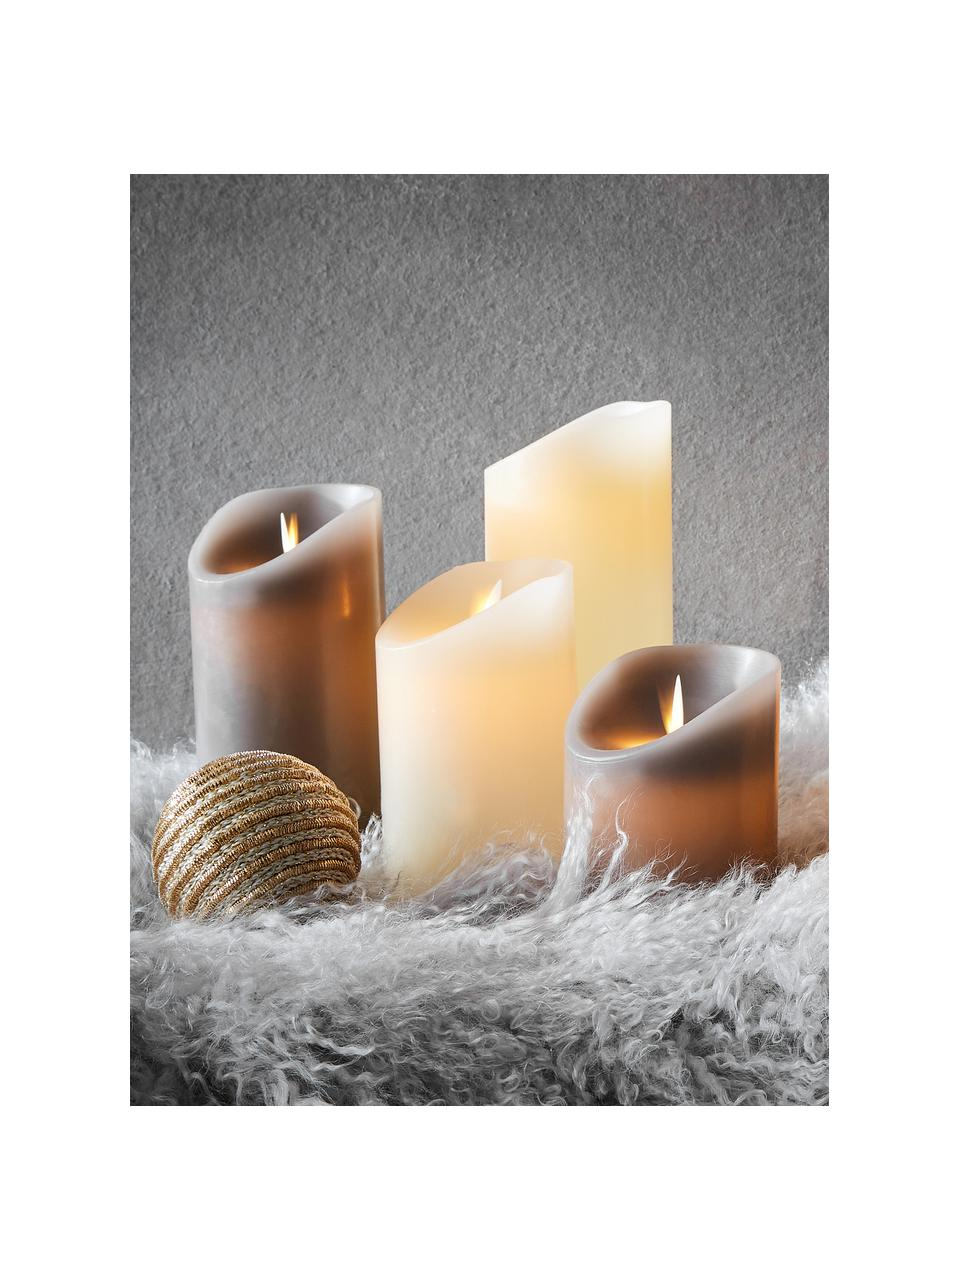 LED-Kerzen Glowing Flame, 3-tlg., Paraffin, Kunststoff, Cremefarben, Sondergrößen